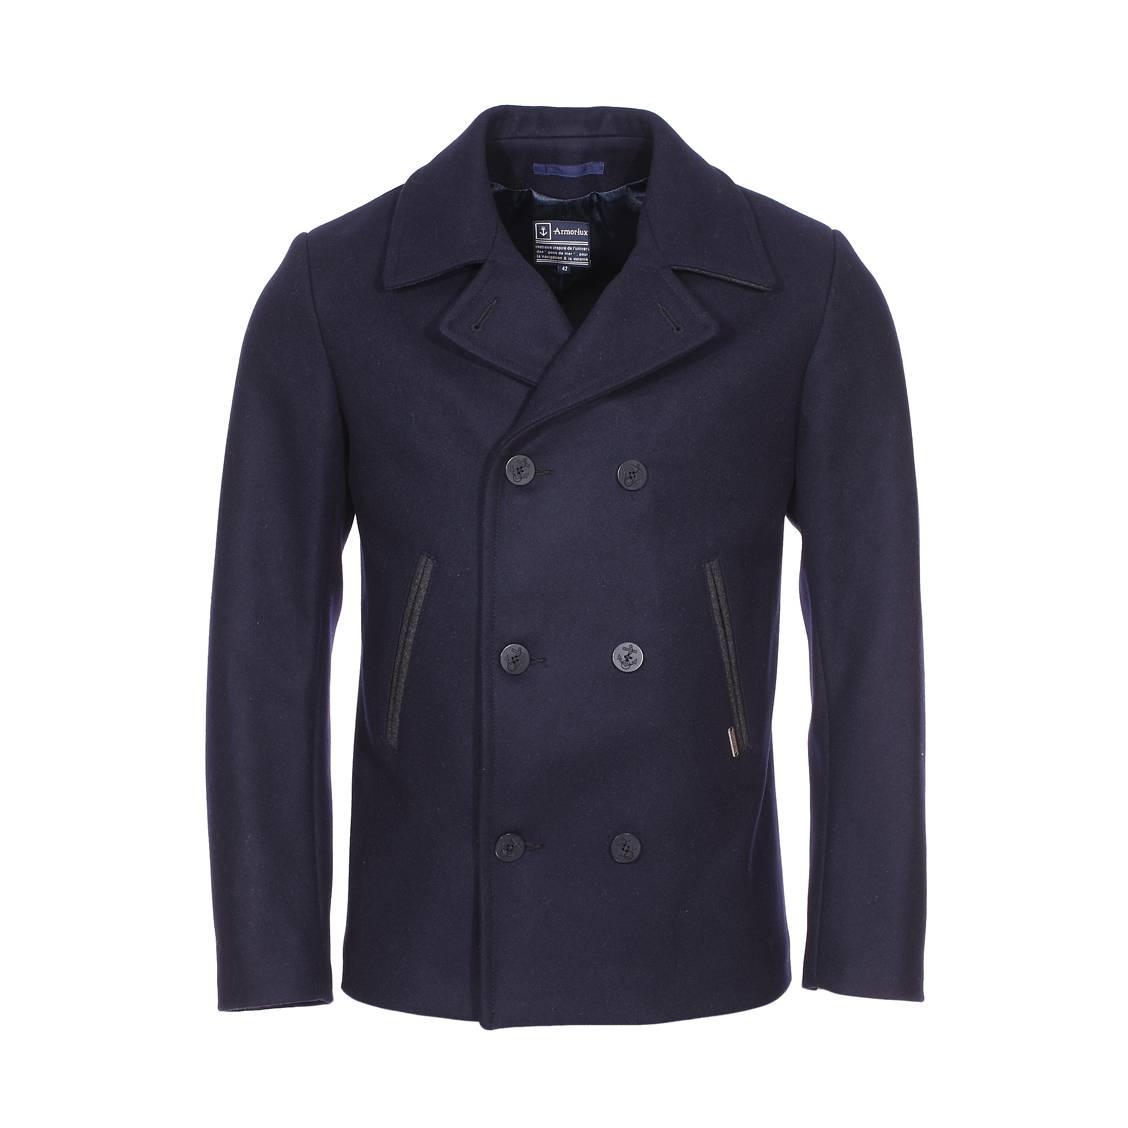 Armor lux - manteau, caban, duffle coat